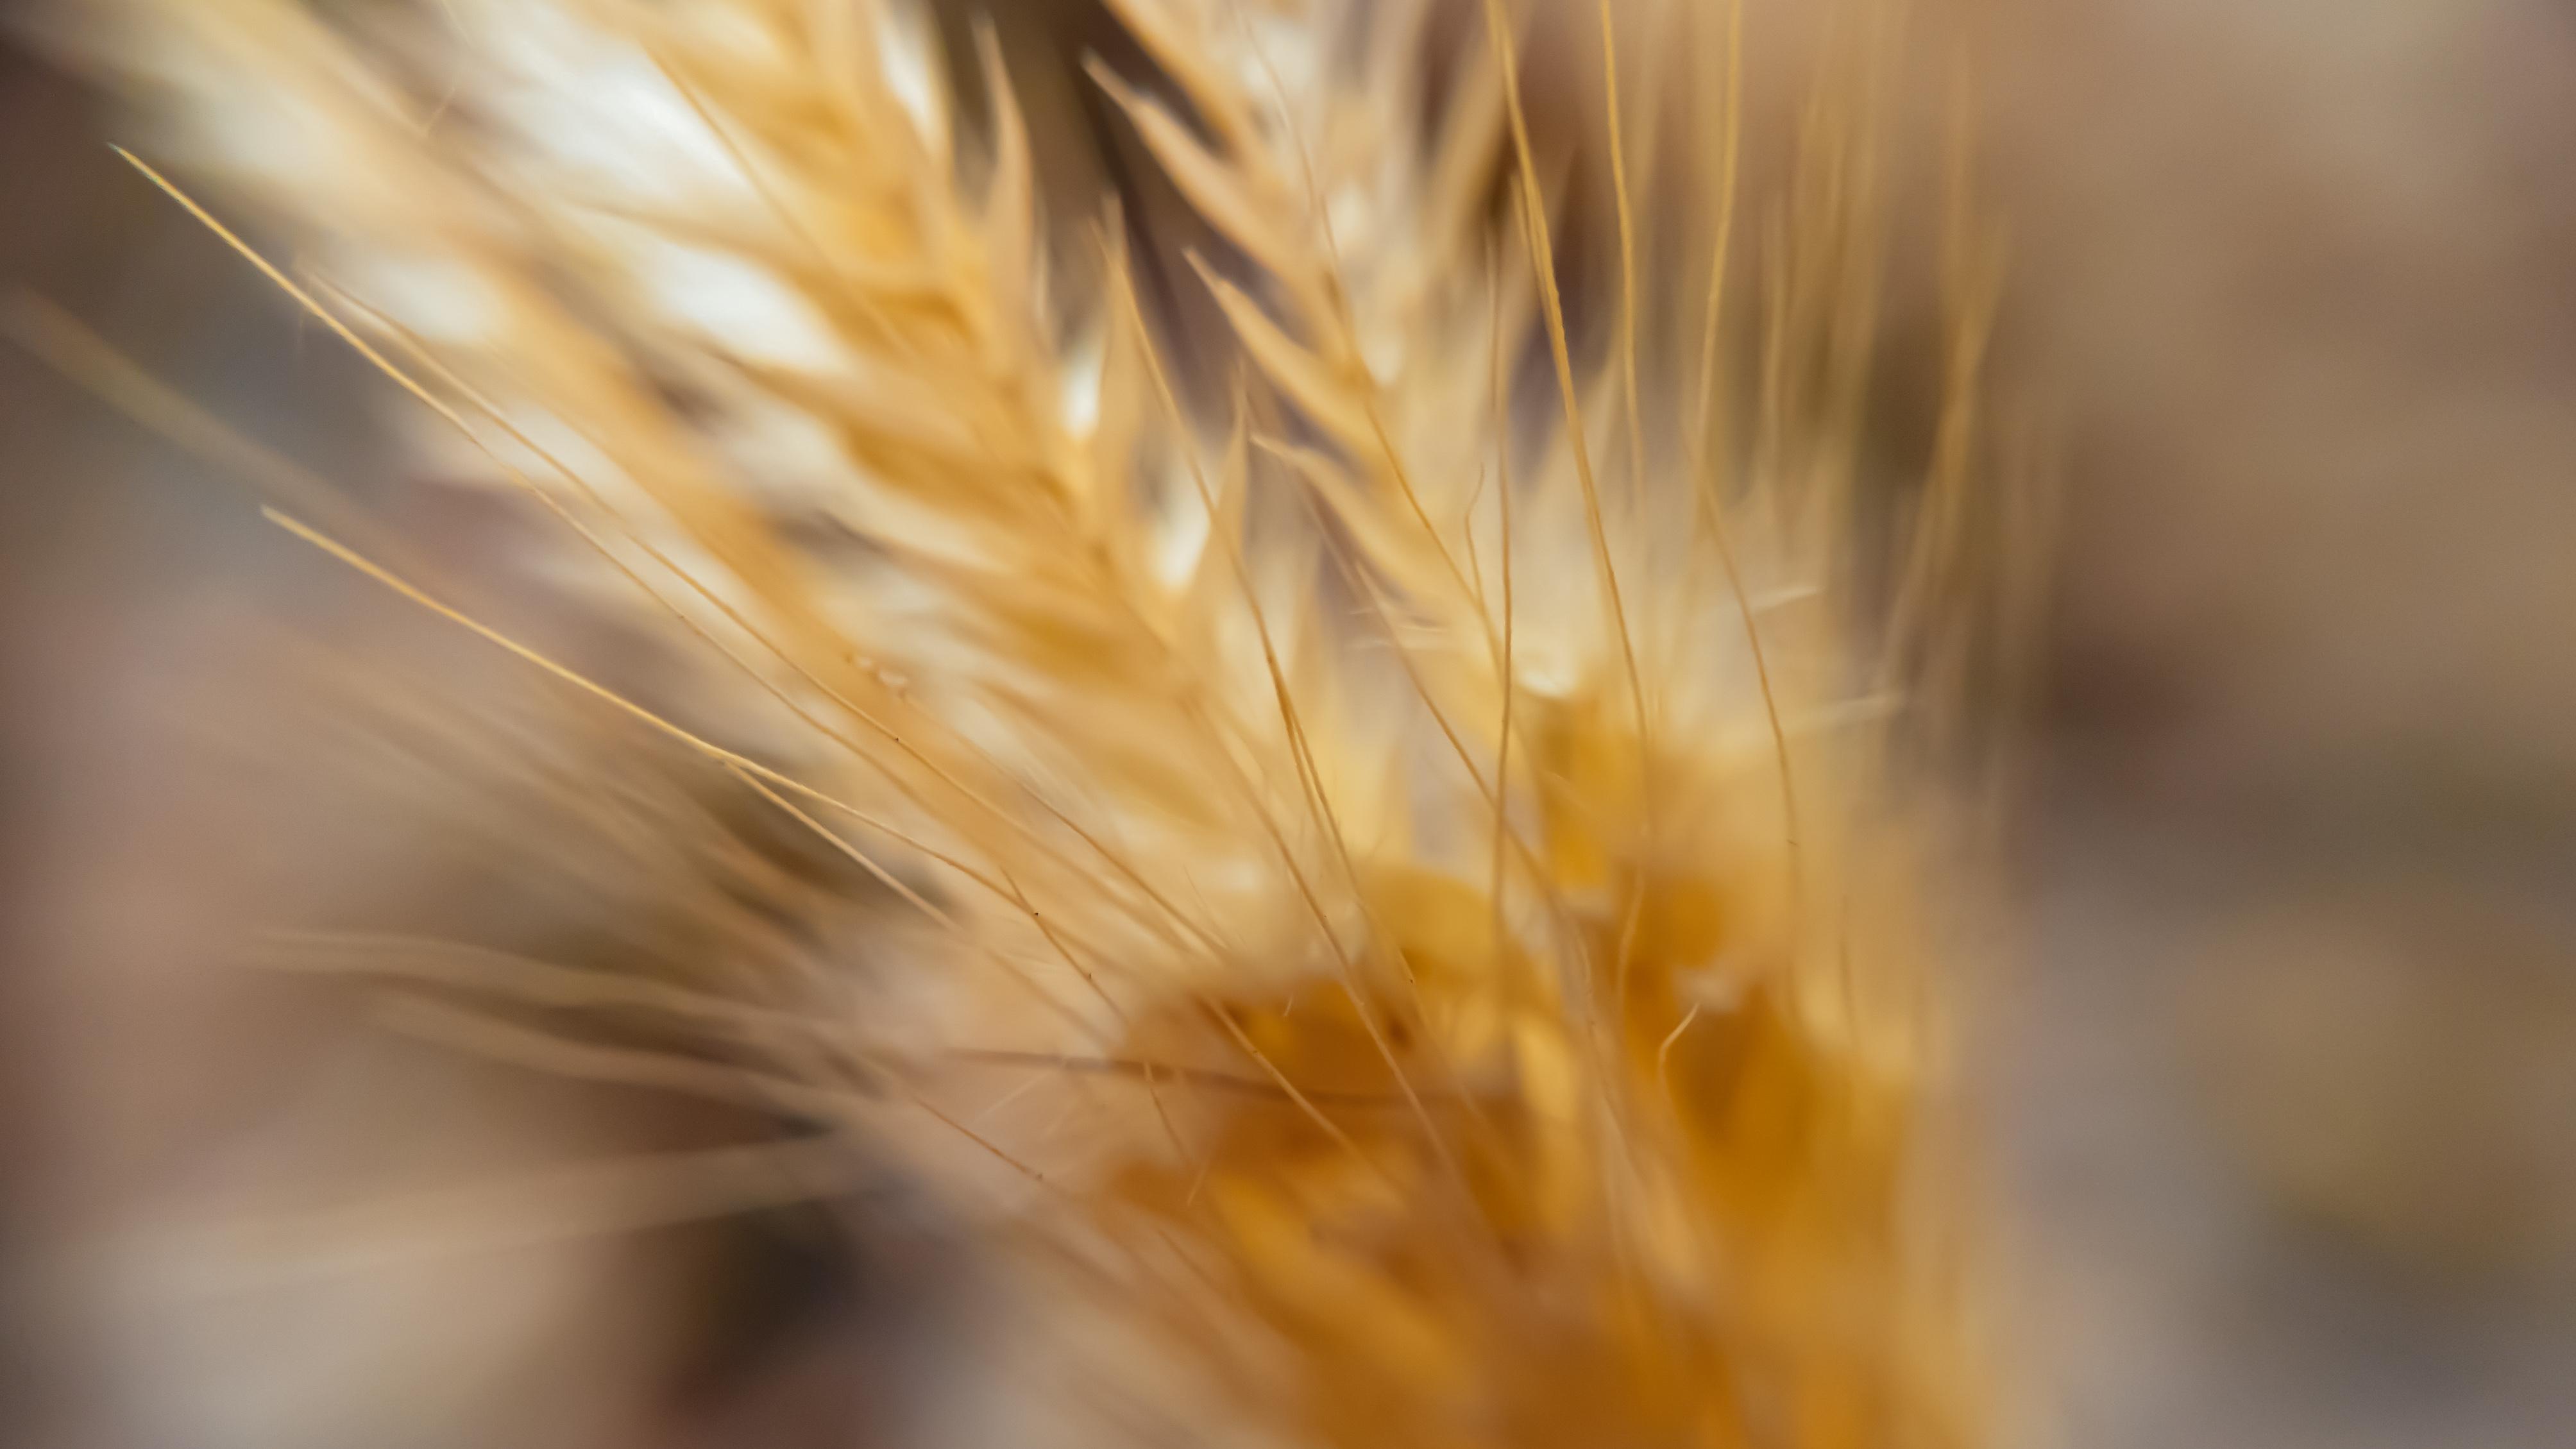 macro wheat 4k 1606575168 - Macro Wheat 4k - Macro Wheat 4k wallpapers